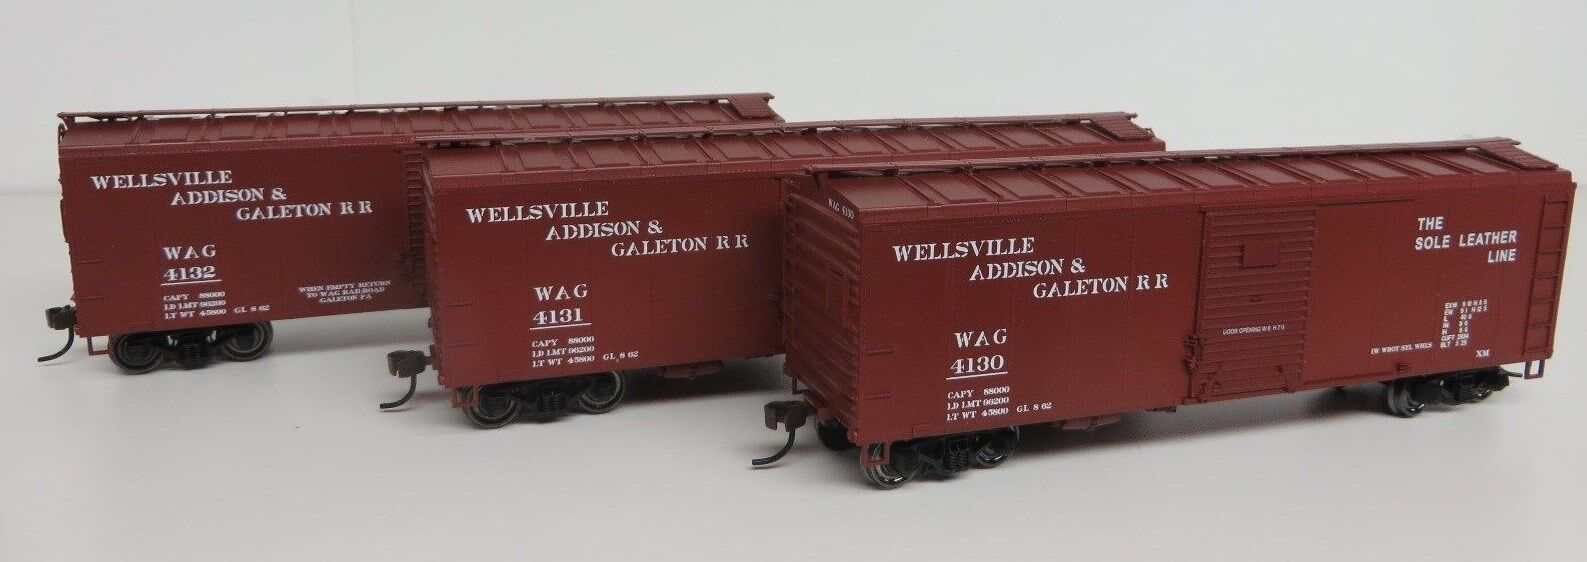 Accurail WELLSVILLE ADDISON /& GALETON-WAG 40/' Wood Box Car #6075 KIT 80951